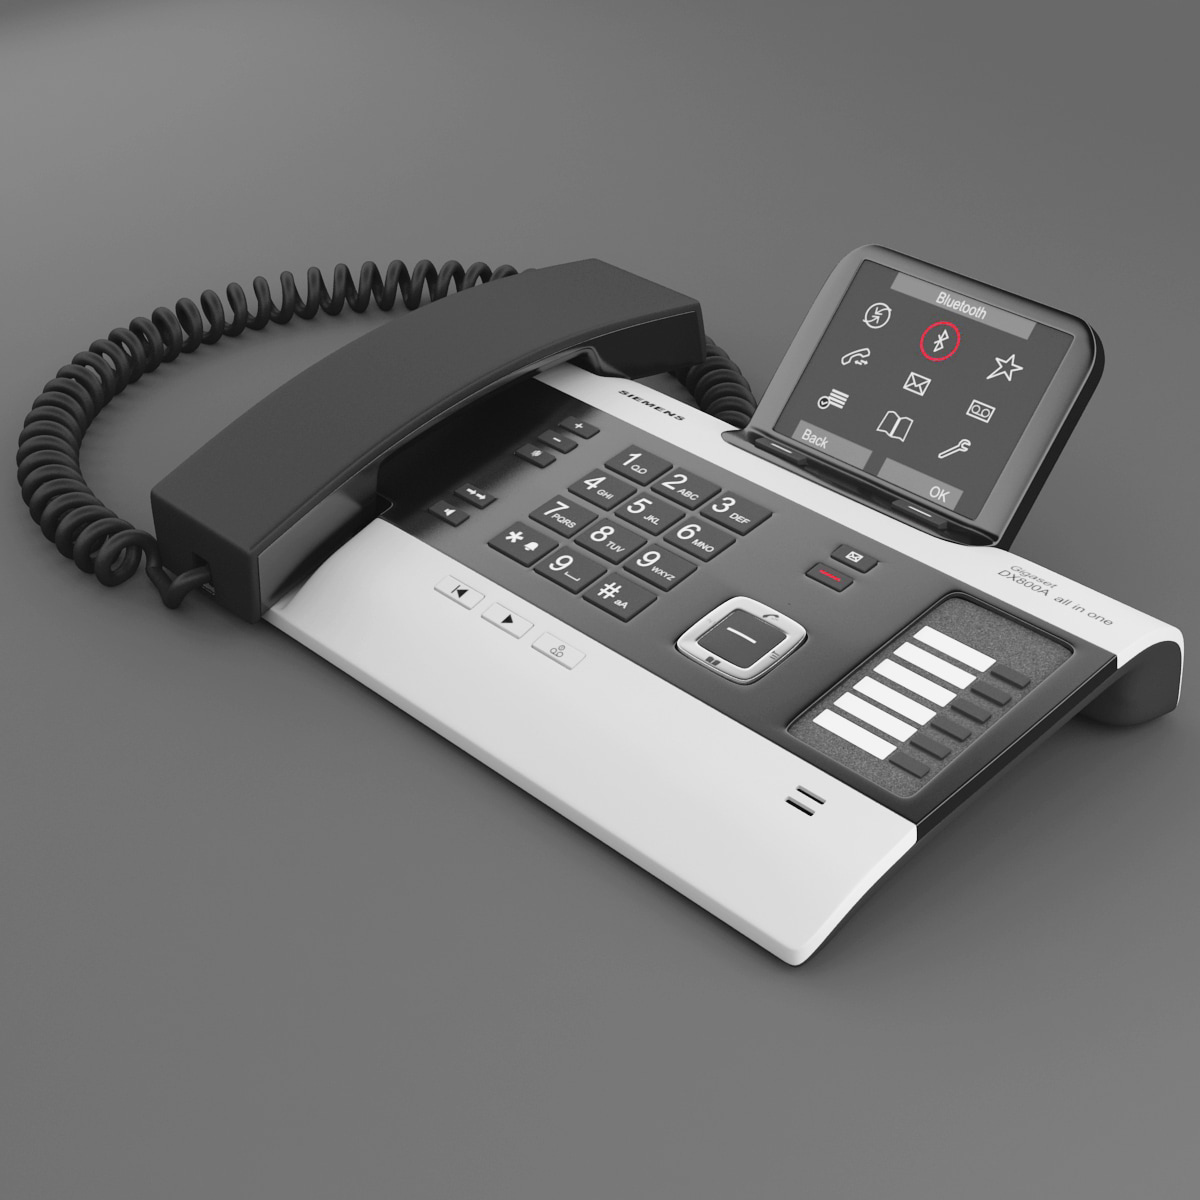 Siemens_IP_Phone_Gigaset_DX800A_01.jpg